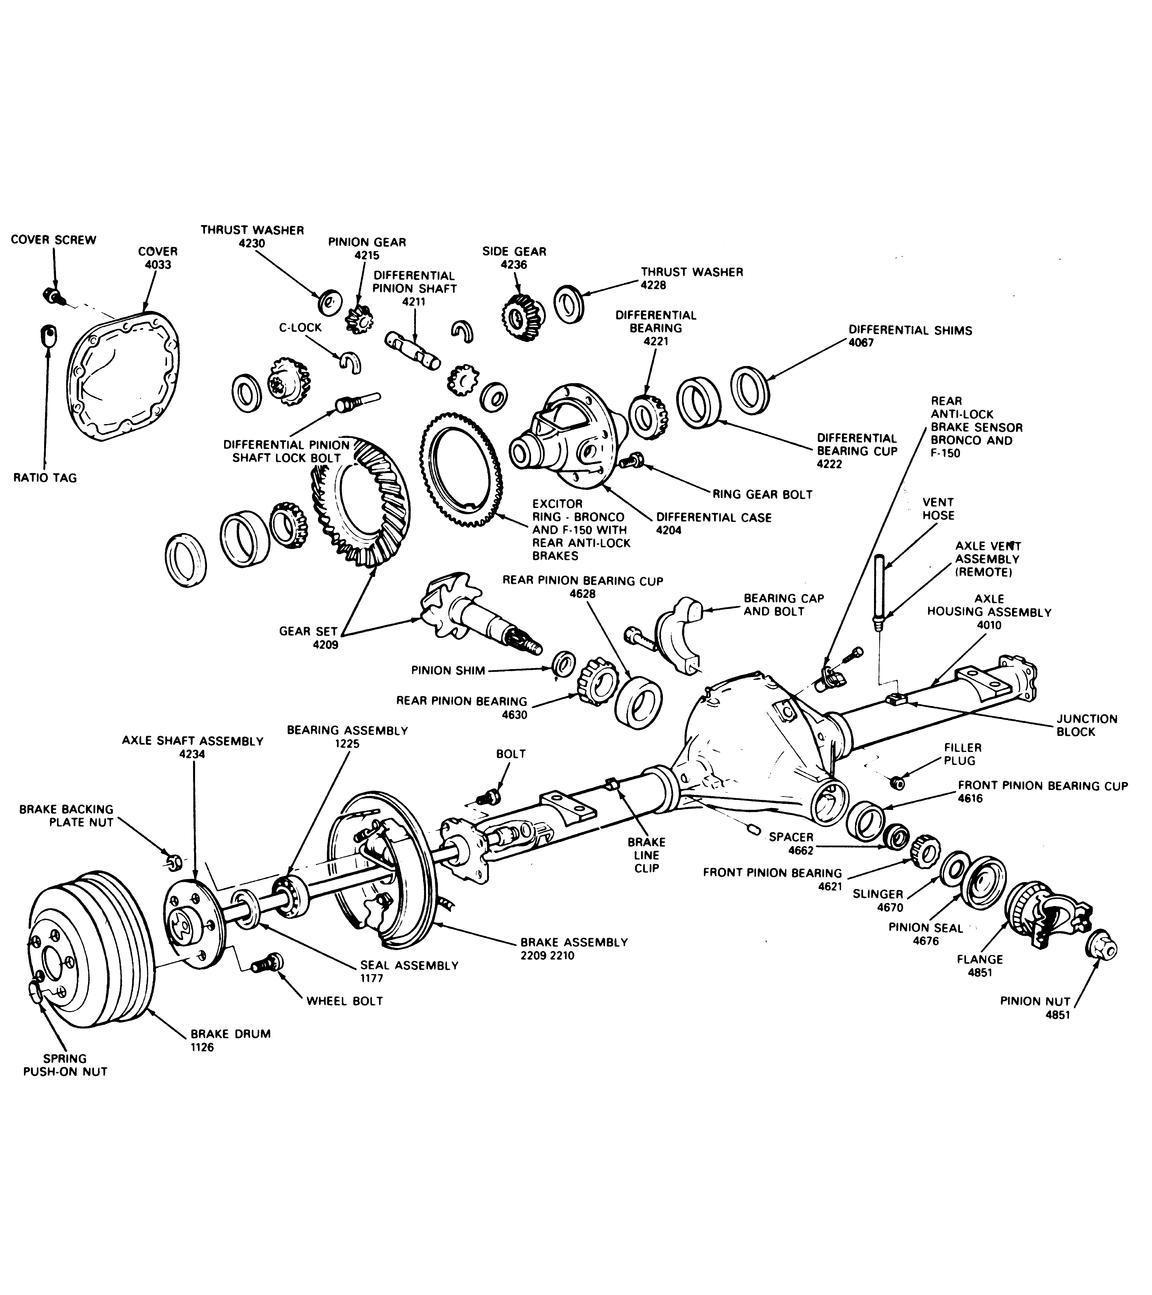 02 expedition rear suspension diagram wiring schematic